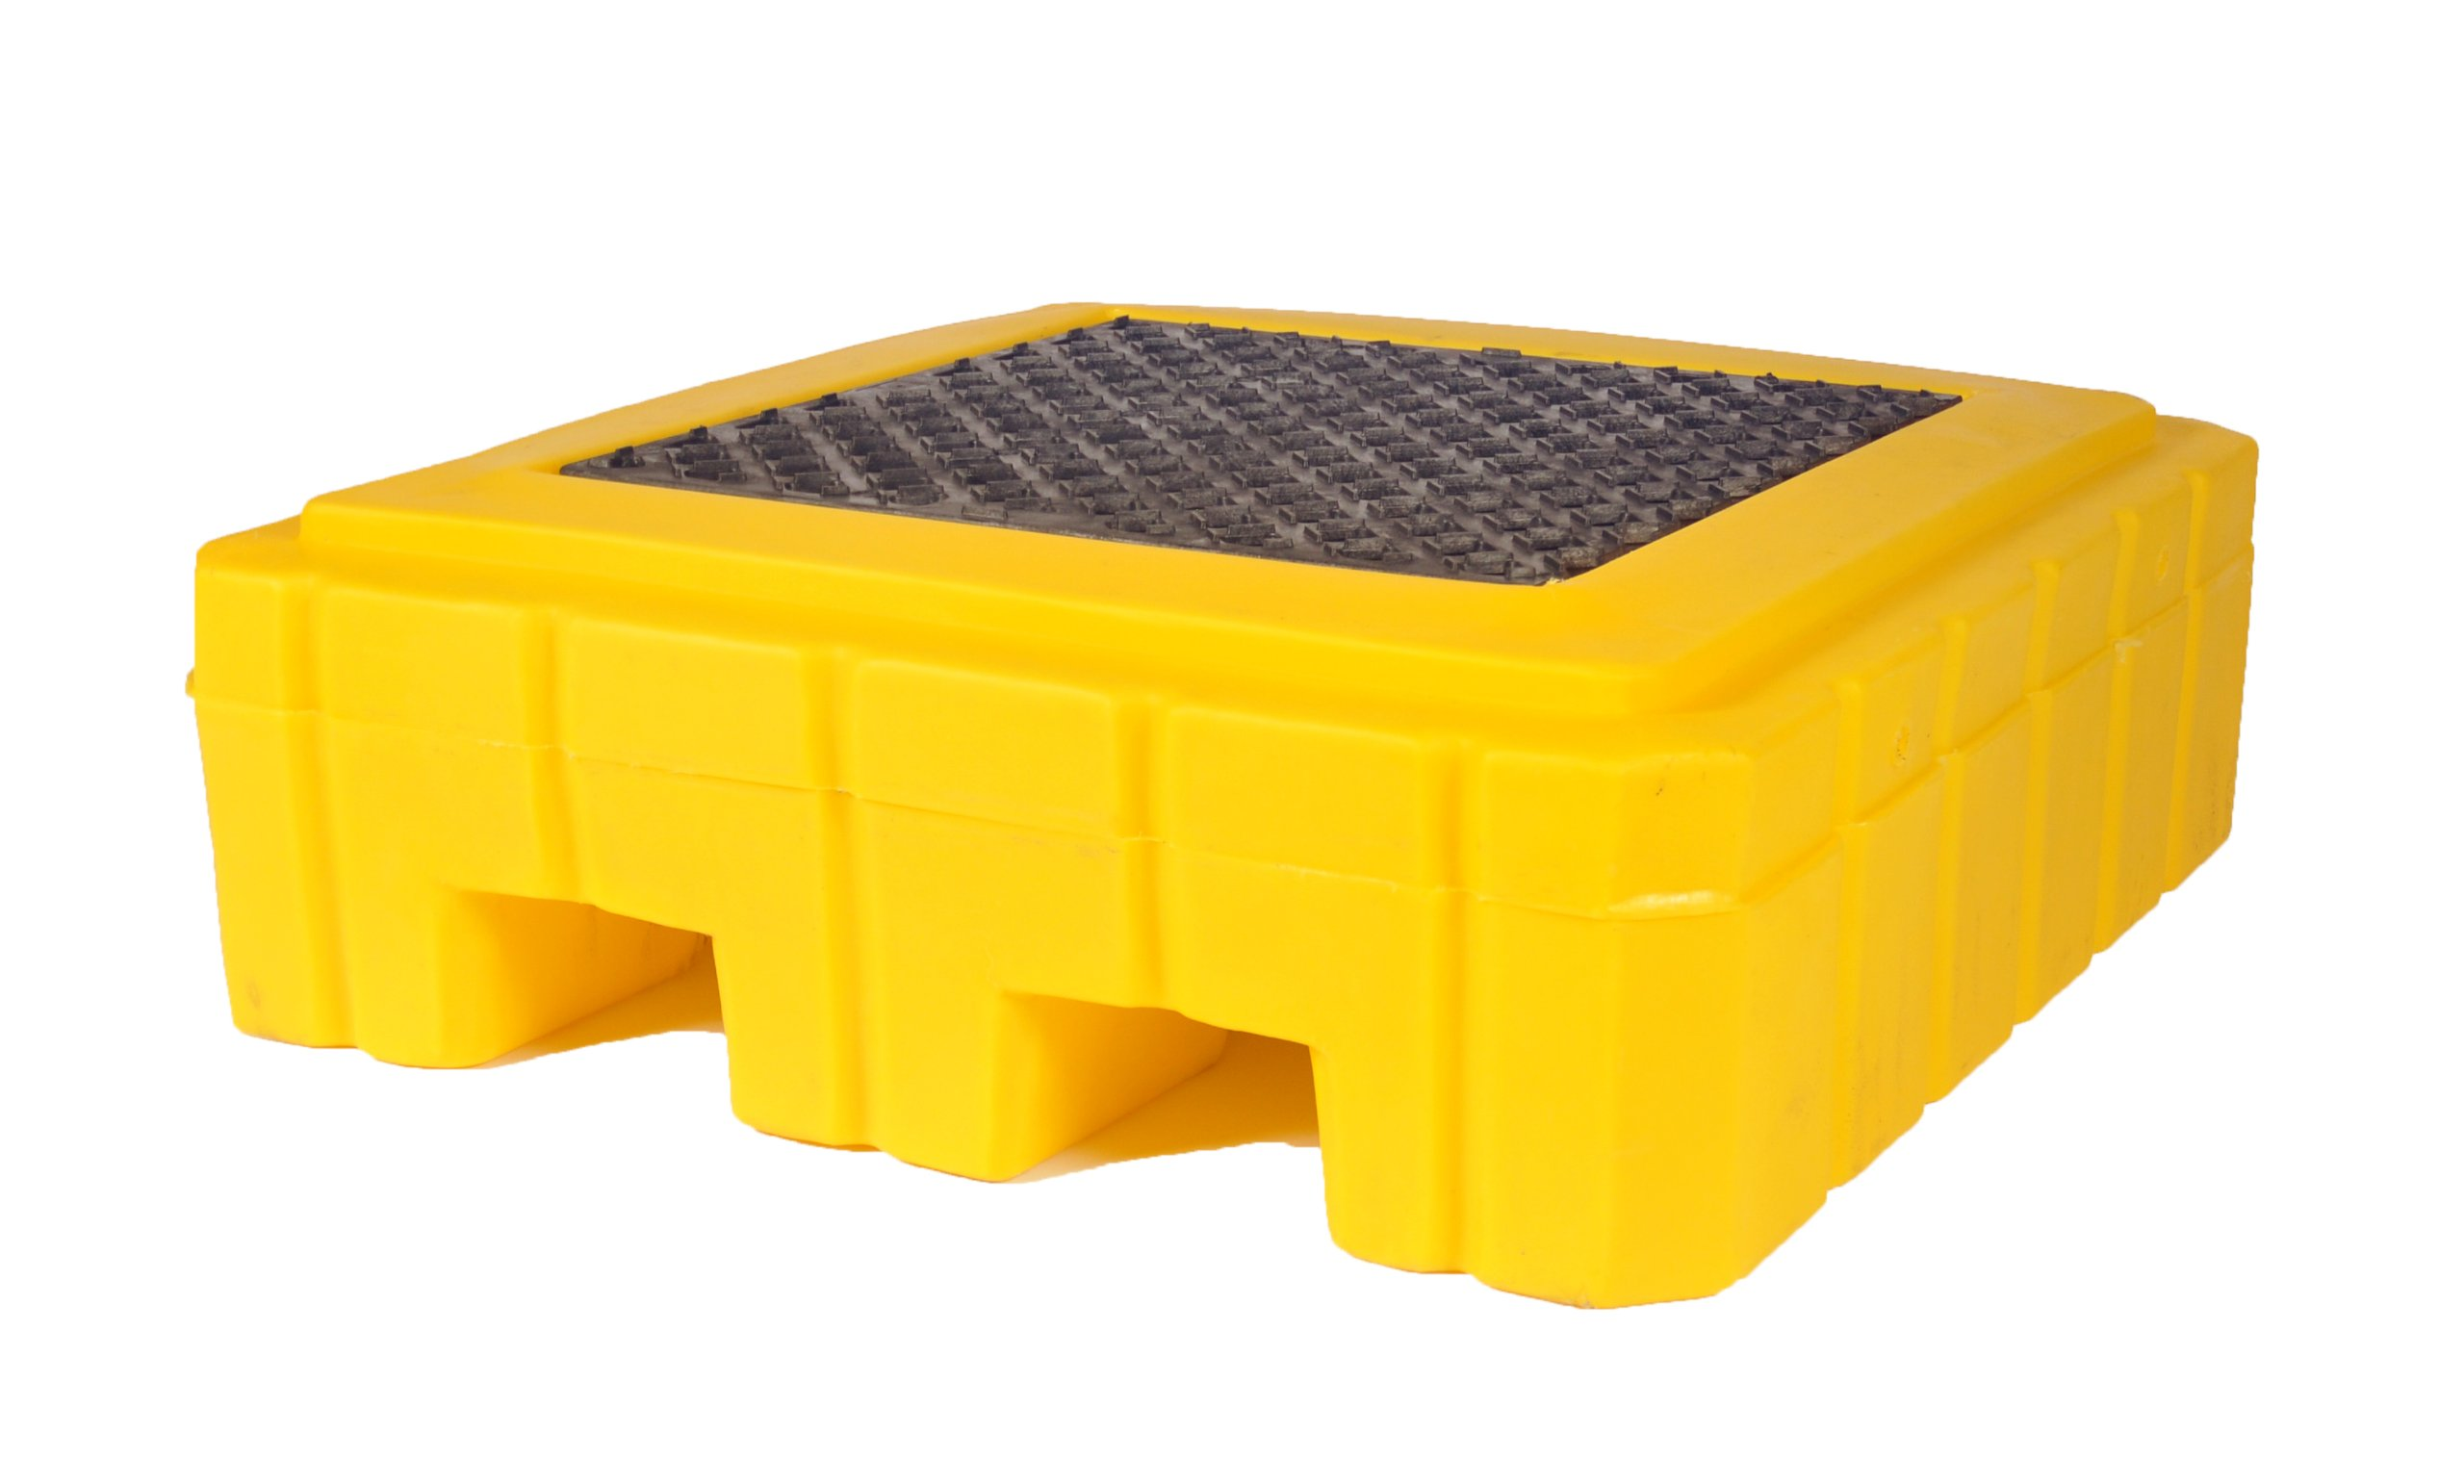 UltraTech 9606 Premier Polyethylene Ultra-Spill Pallet P1 Plus, 800 lbs Capacity, 5 Year Warranty, Yellow